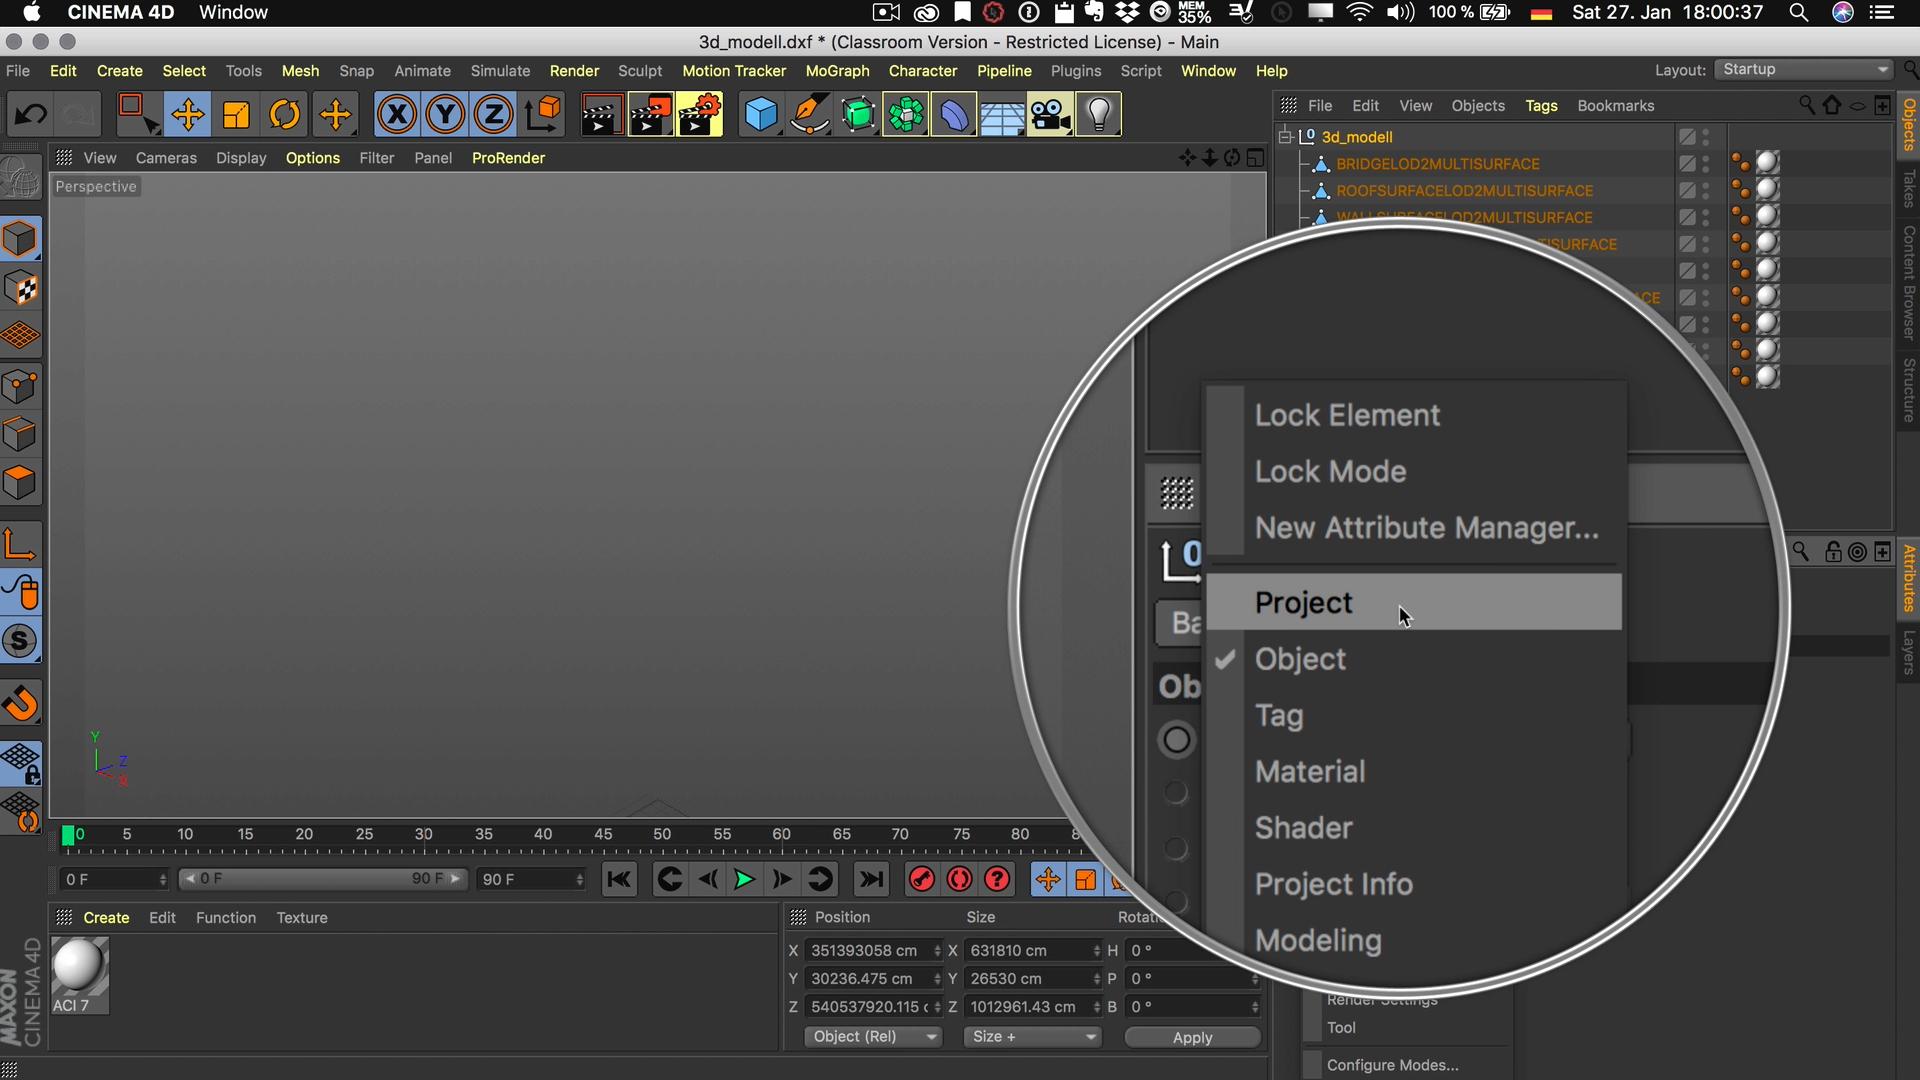 Cinema4D 3D-Stadtmodell Attribute Manager Projekt